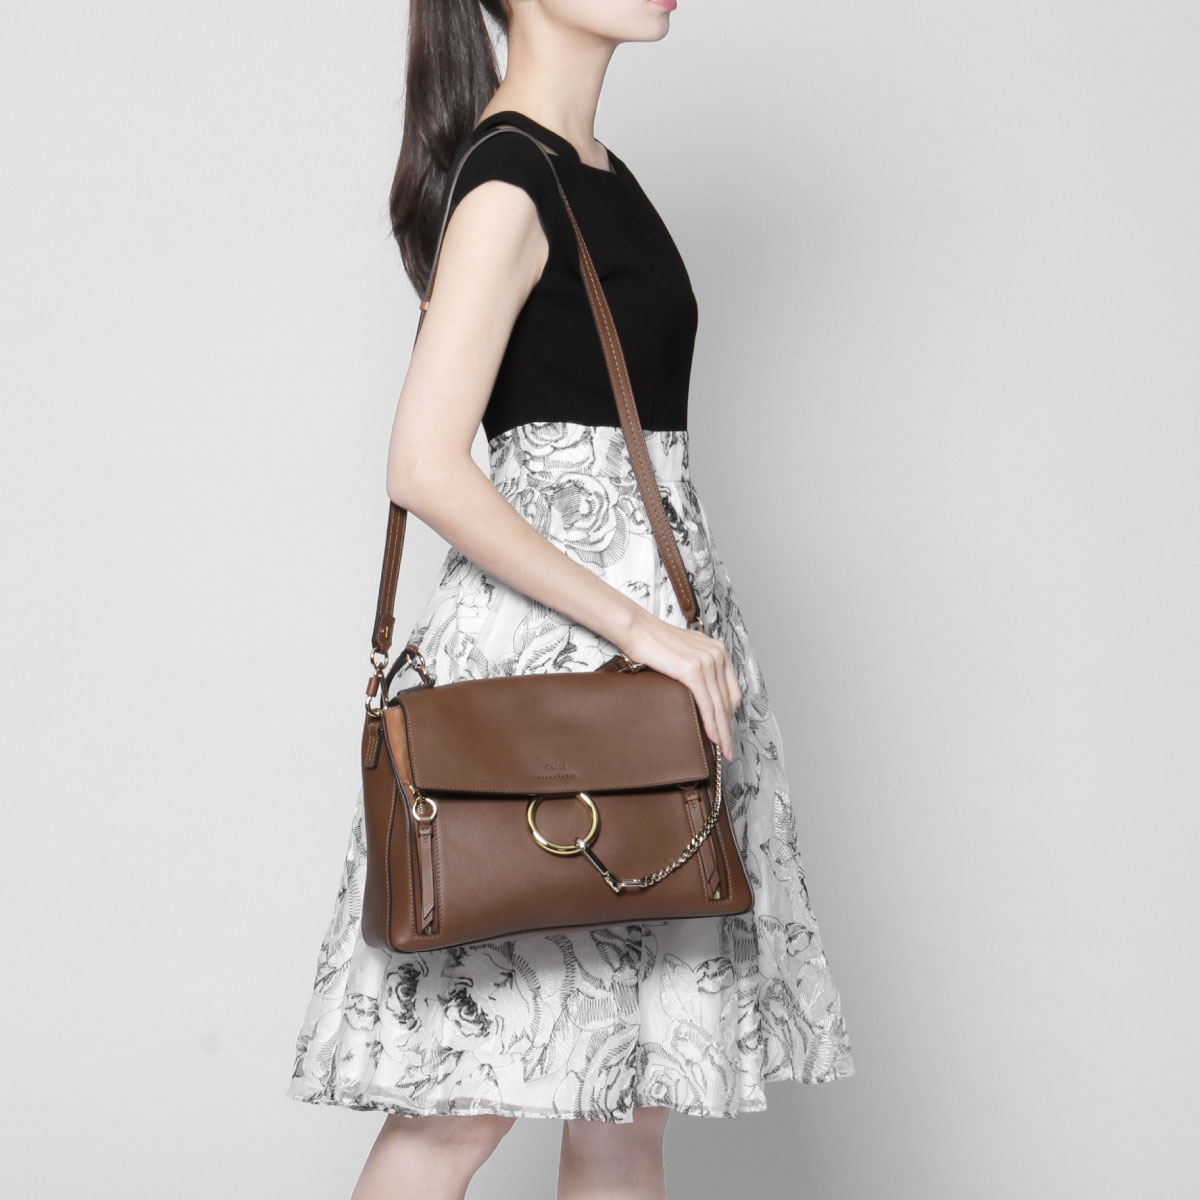 4b41981b10 Kuroe CHLOE bag lady C17WS321 HGJ 25M shoulder handbag medium FAYE DAY Fay  D TAN Brown belonging to